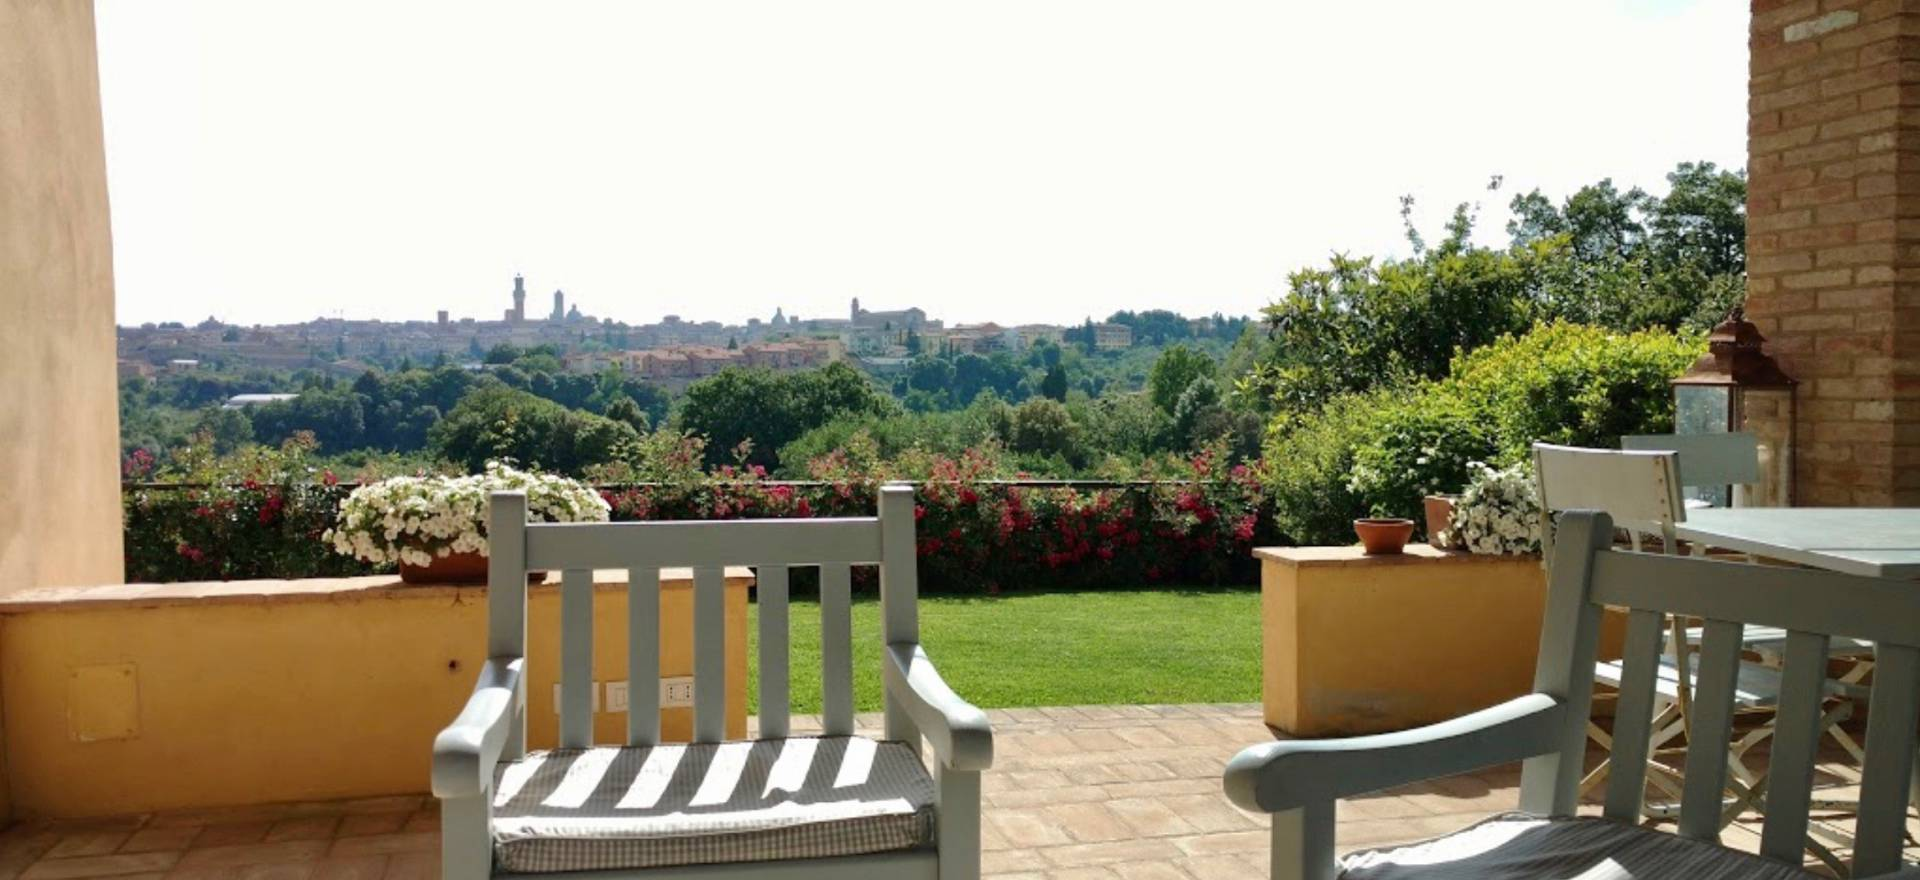 Elegante agriturismo met fantastisch uitzicht op siena - Hoe dicht terras ...